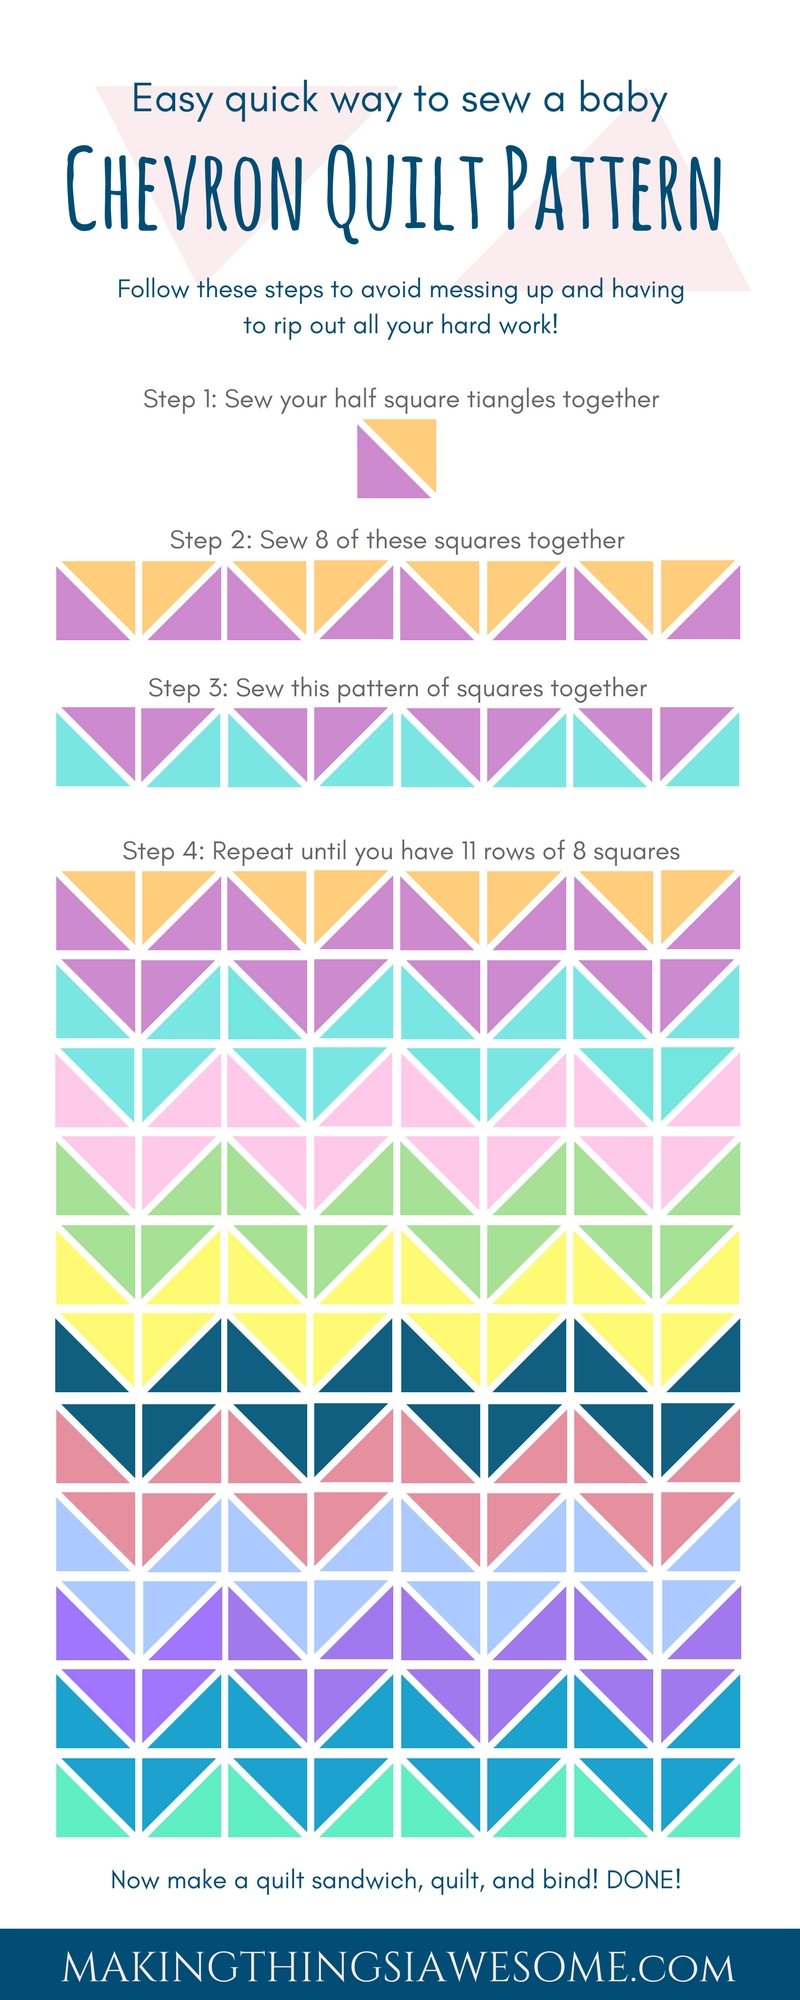 Chevron Quilt Pattern - Quilt Patterns for Beginners! - pattern